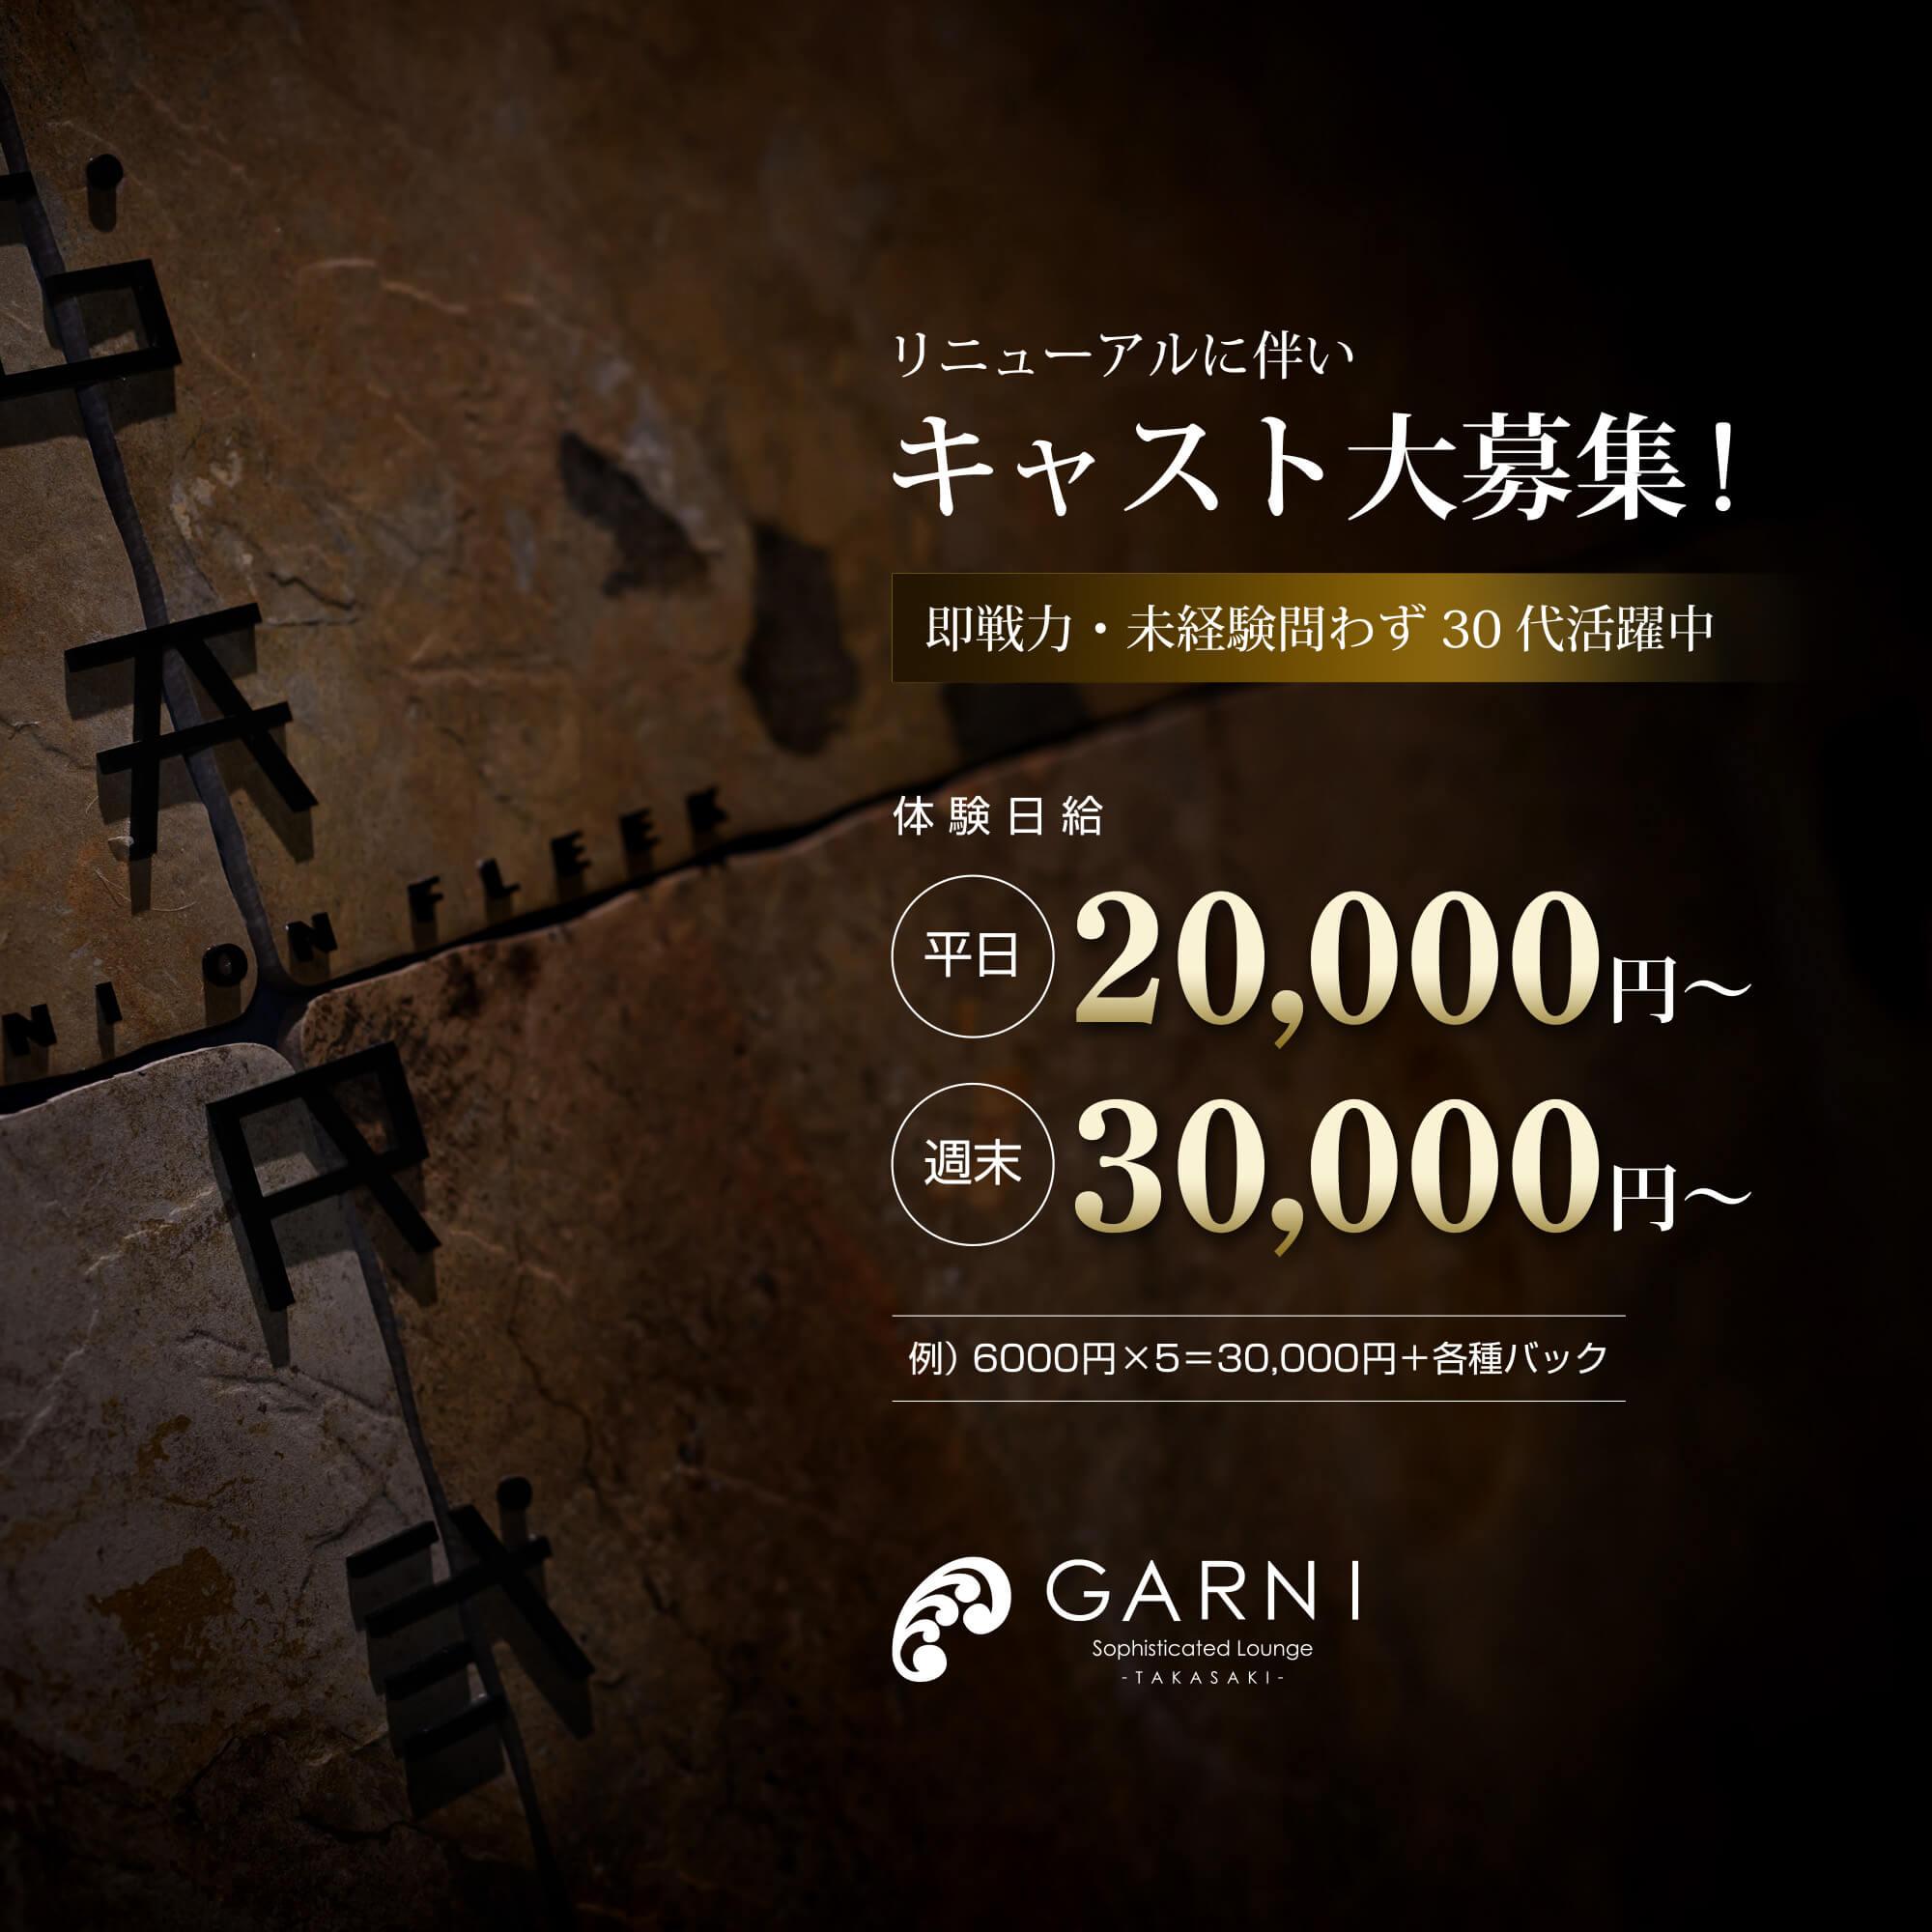 GARNI Sophisticated Lounge TAKASAKI